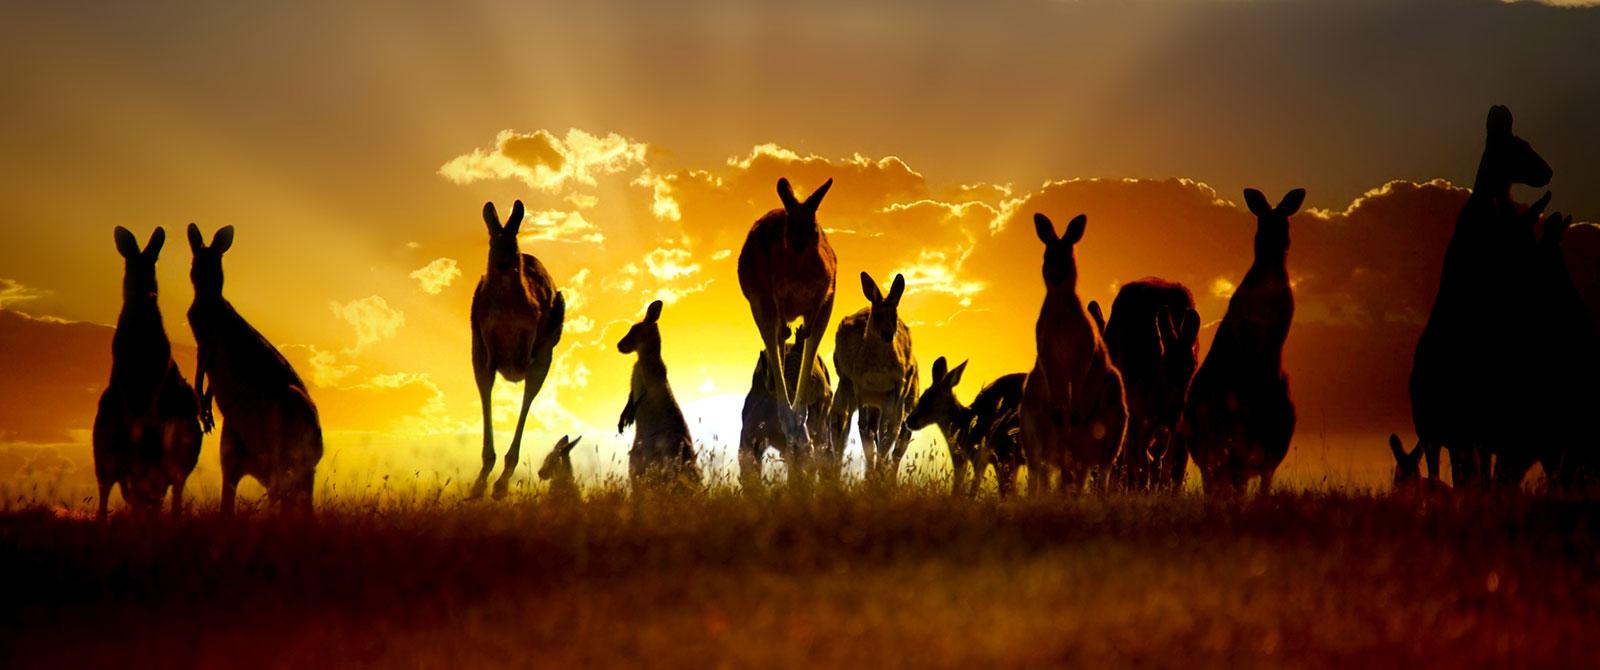 Kangaroos Hopping Through a Field at Sunset